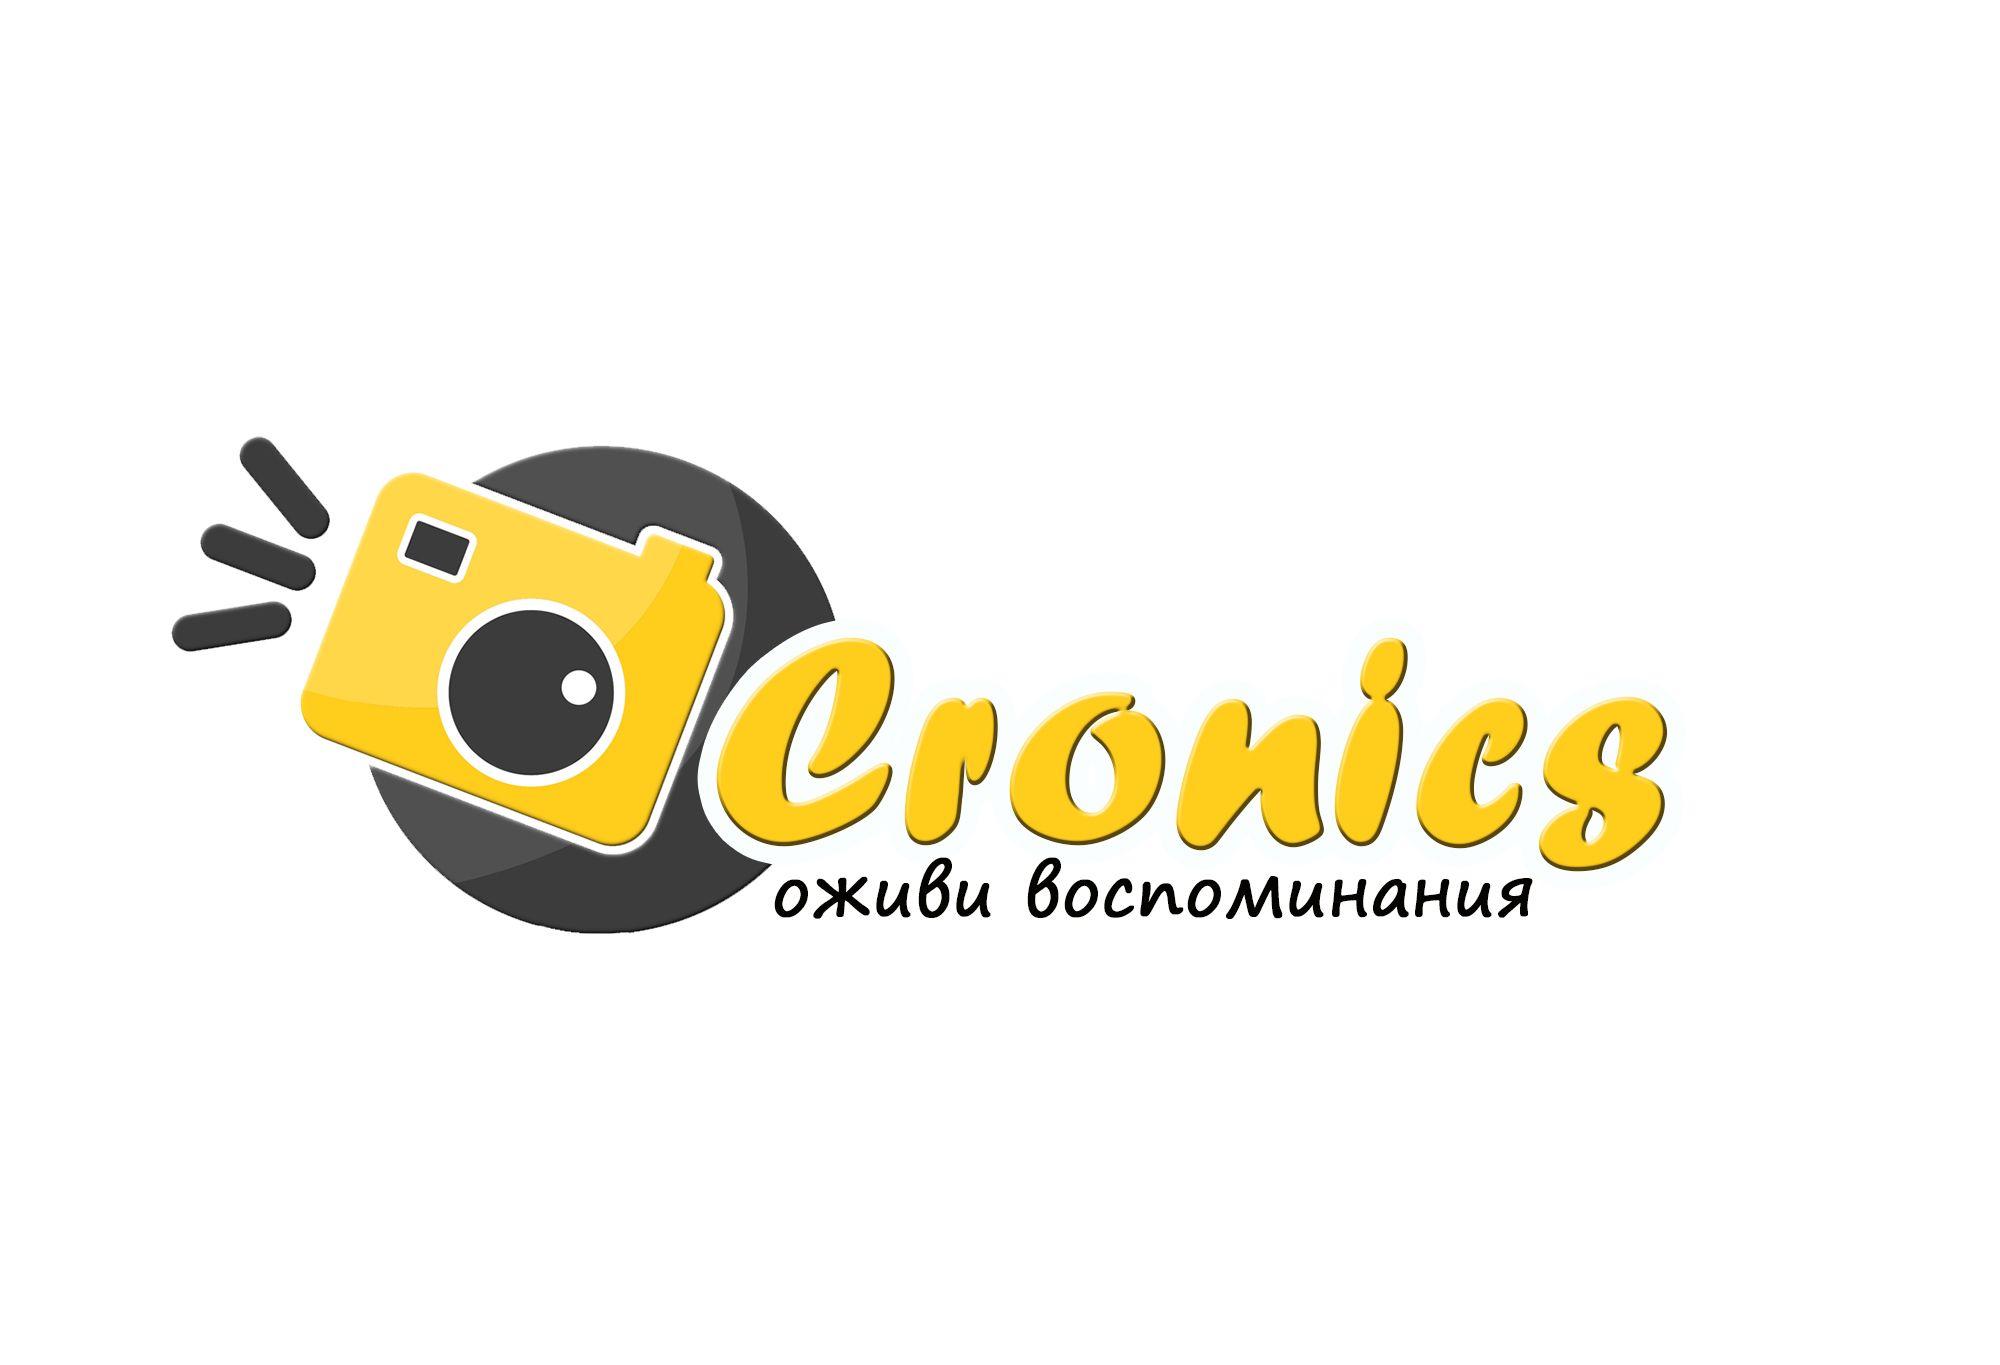 Логотип сервиса Chronics - дизайнер Lilipysi4ek